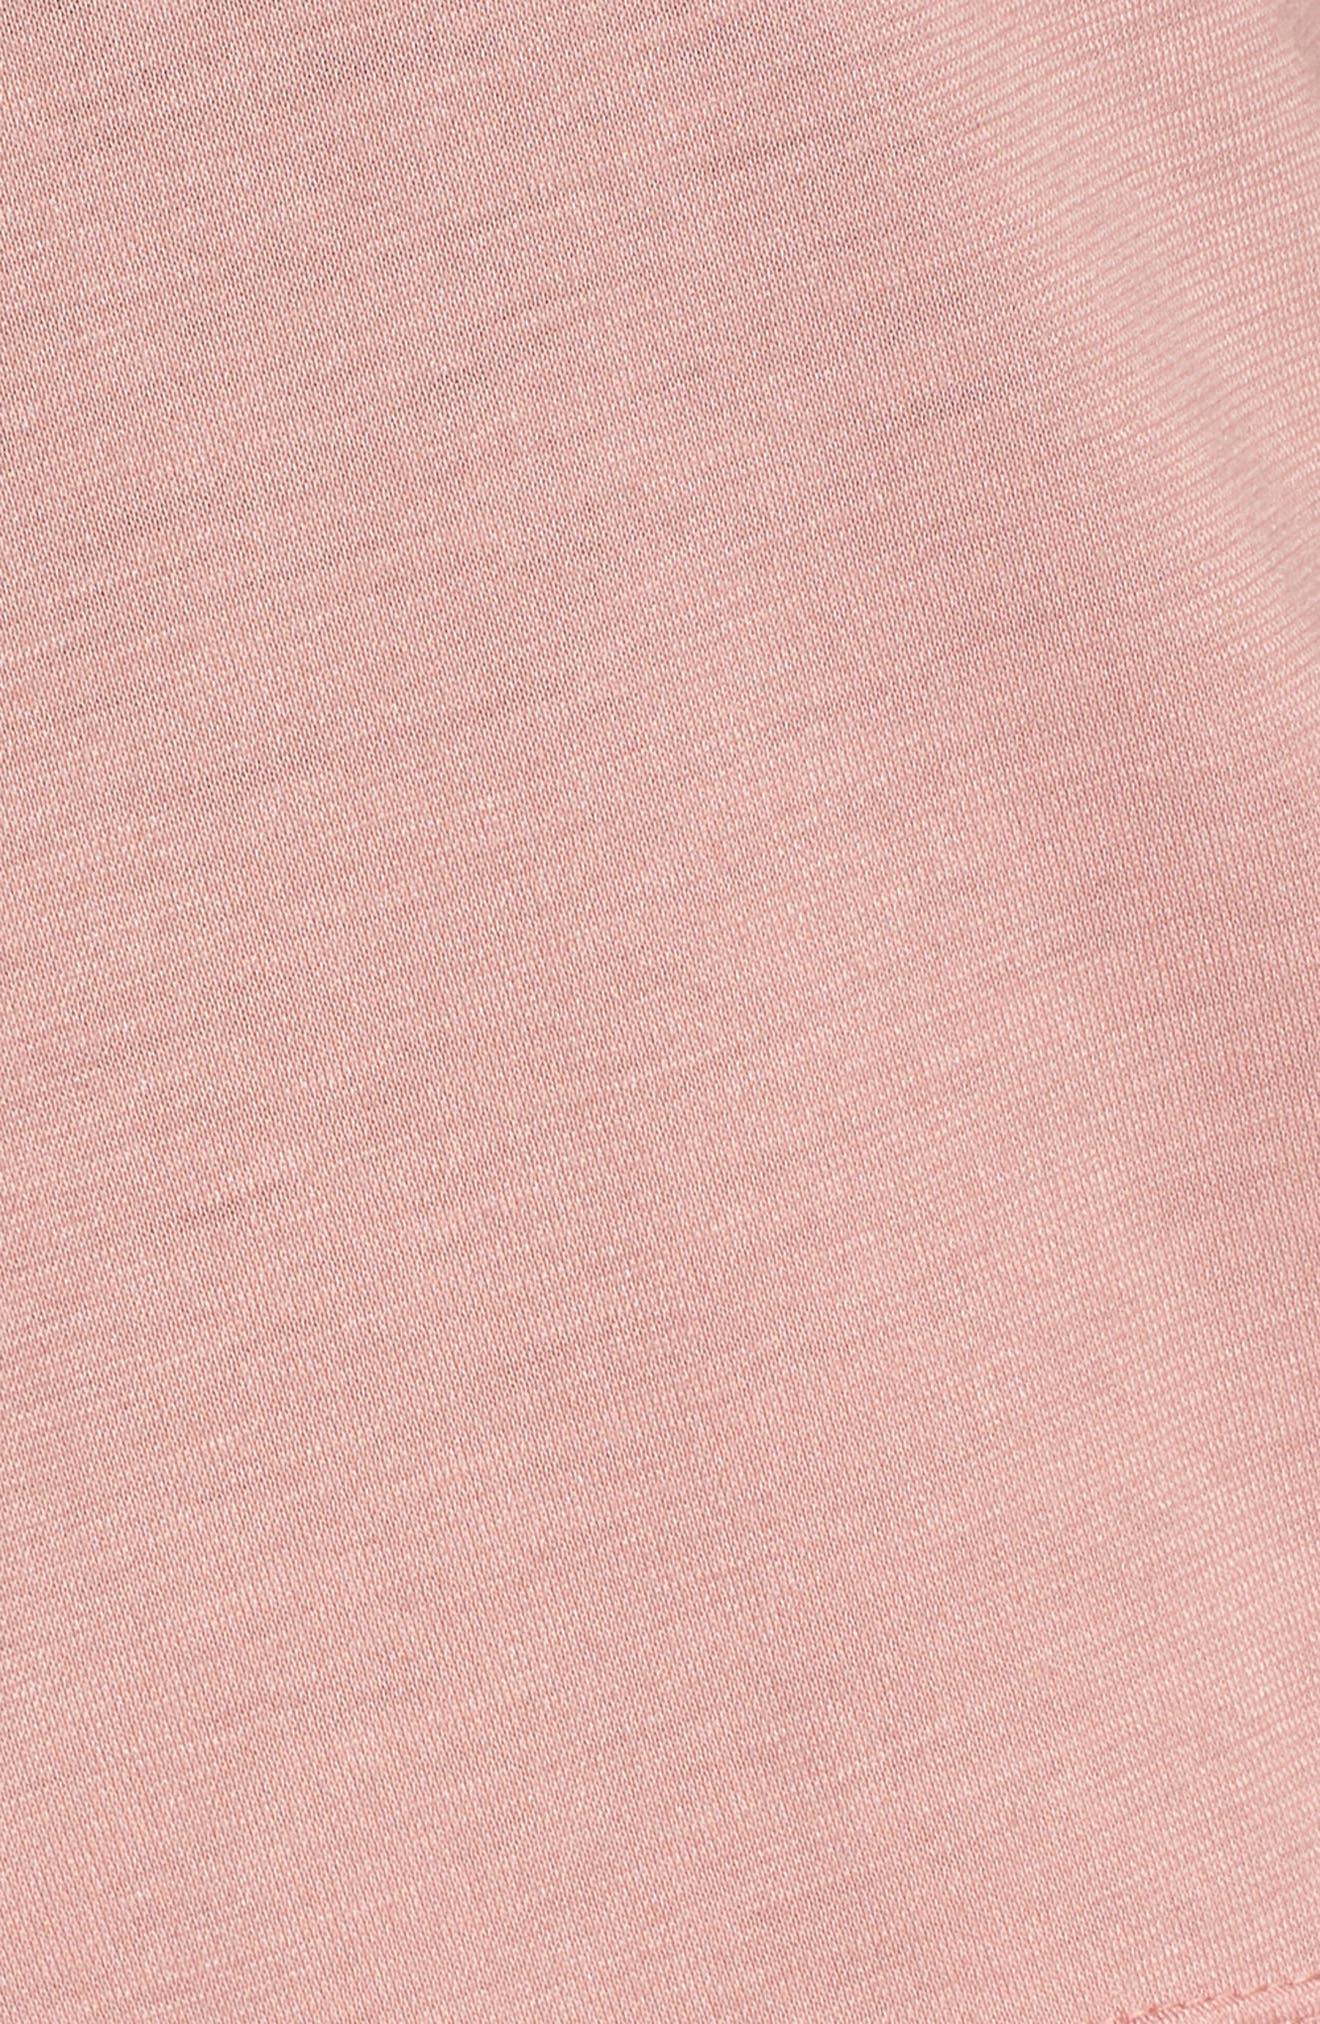 Sportswear Crop Top,                             Alternate thumbnail 6, color,                             Rust Pink/ White